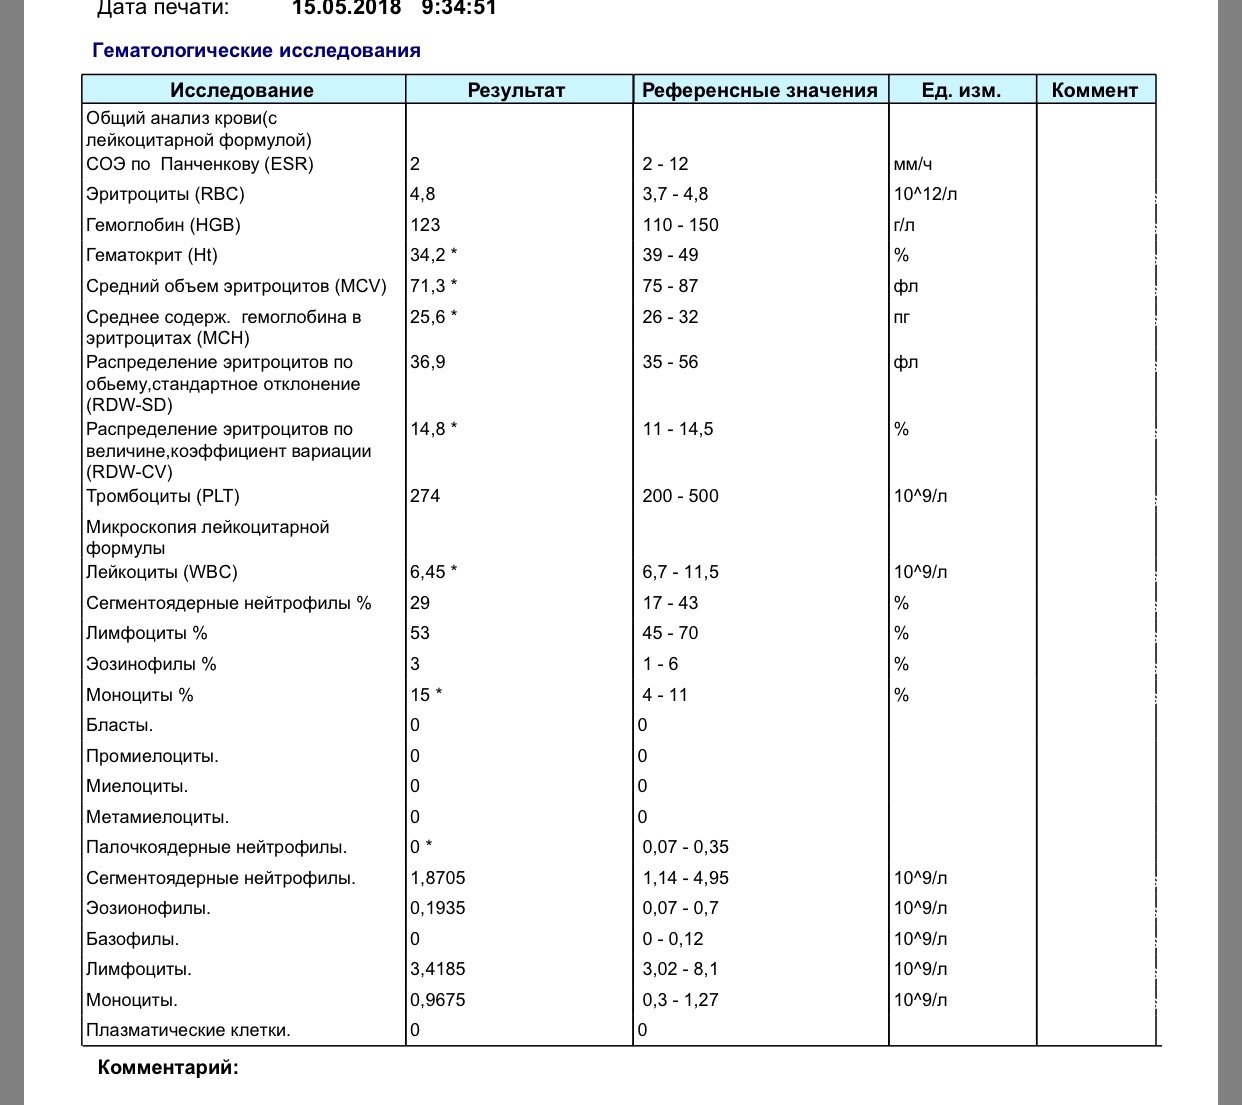 Крови общий 9 анализ моноциты сахар крови на подготовка анализ крови к сдаче